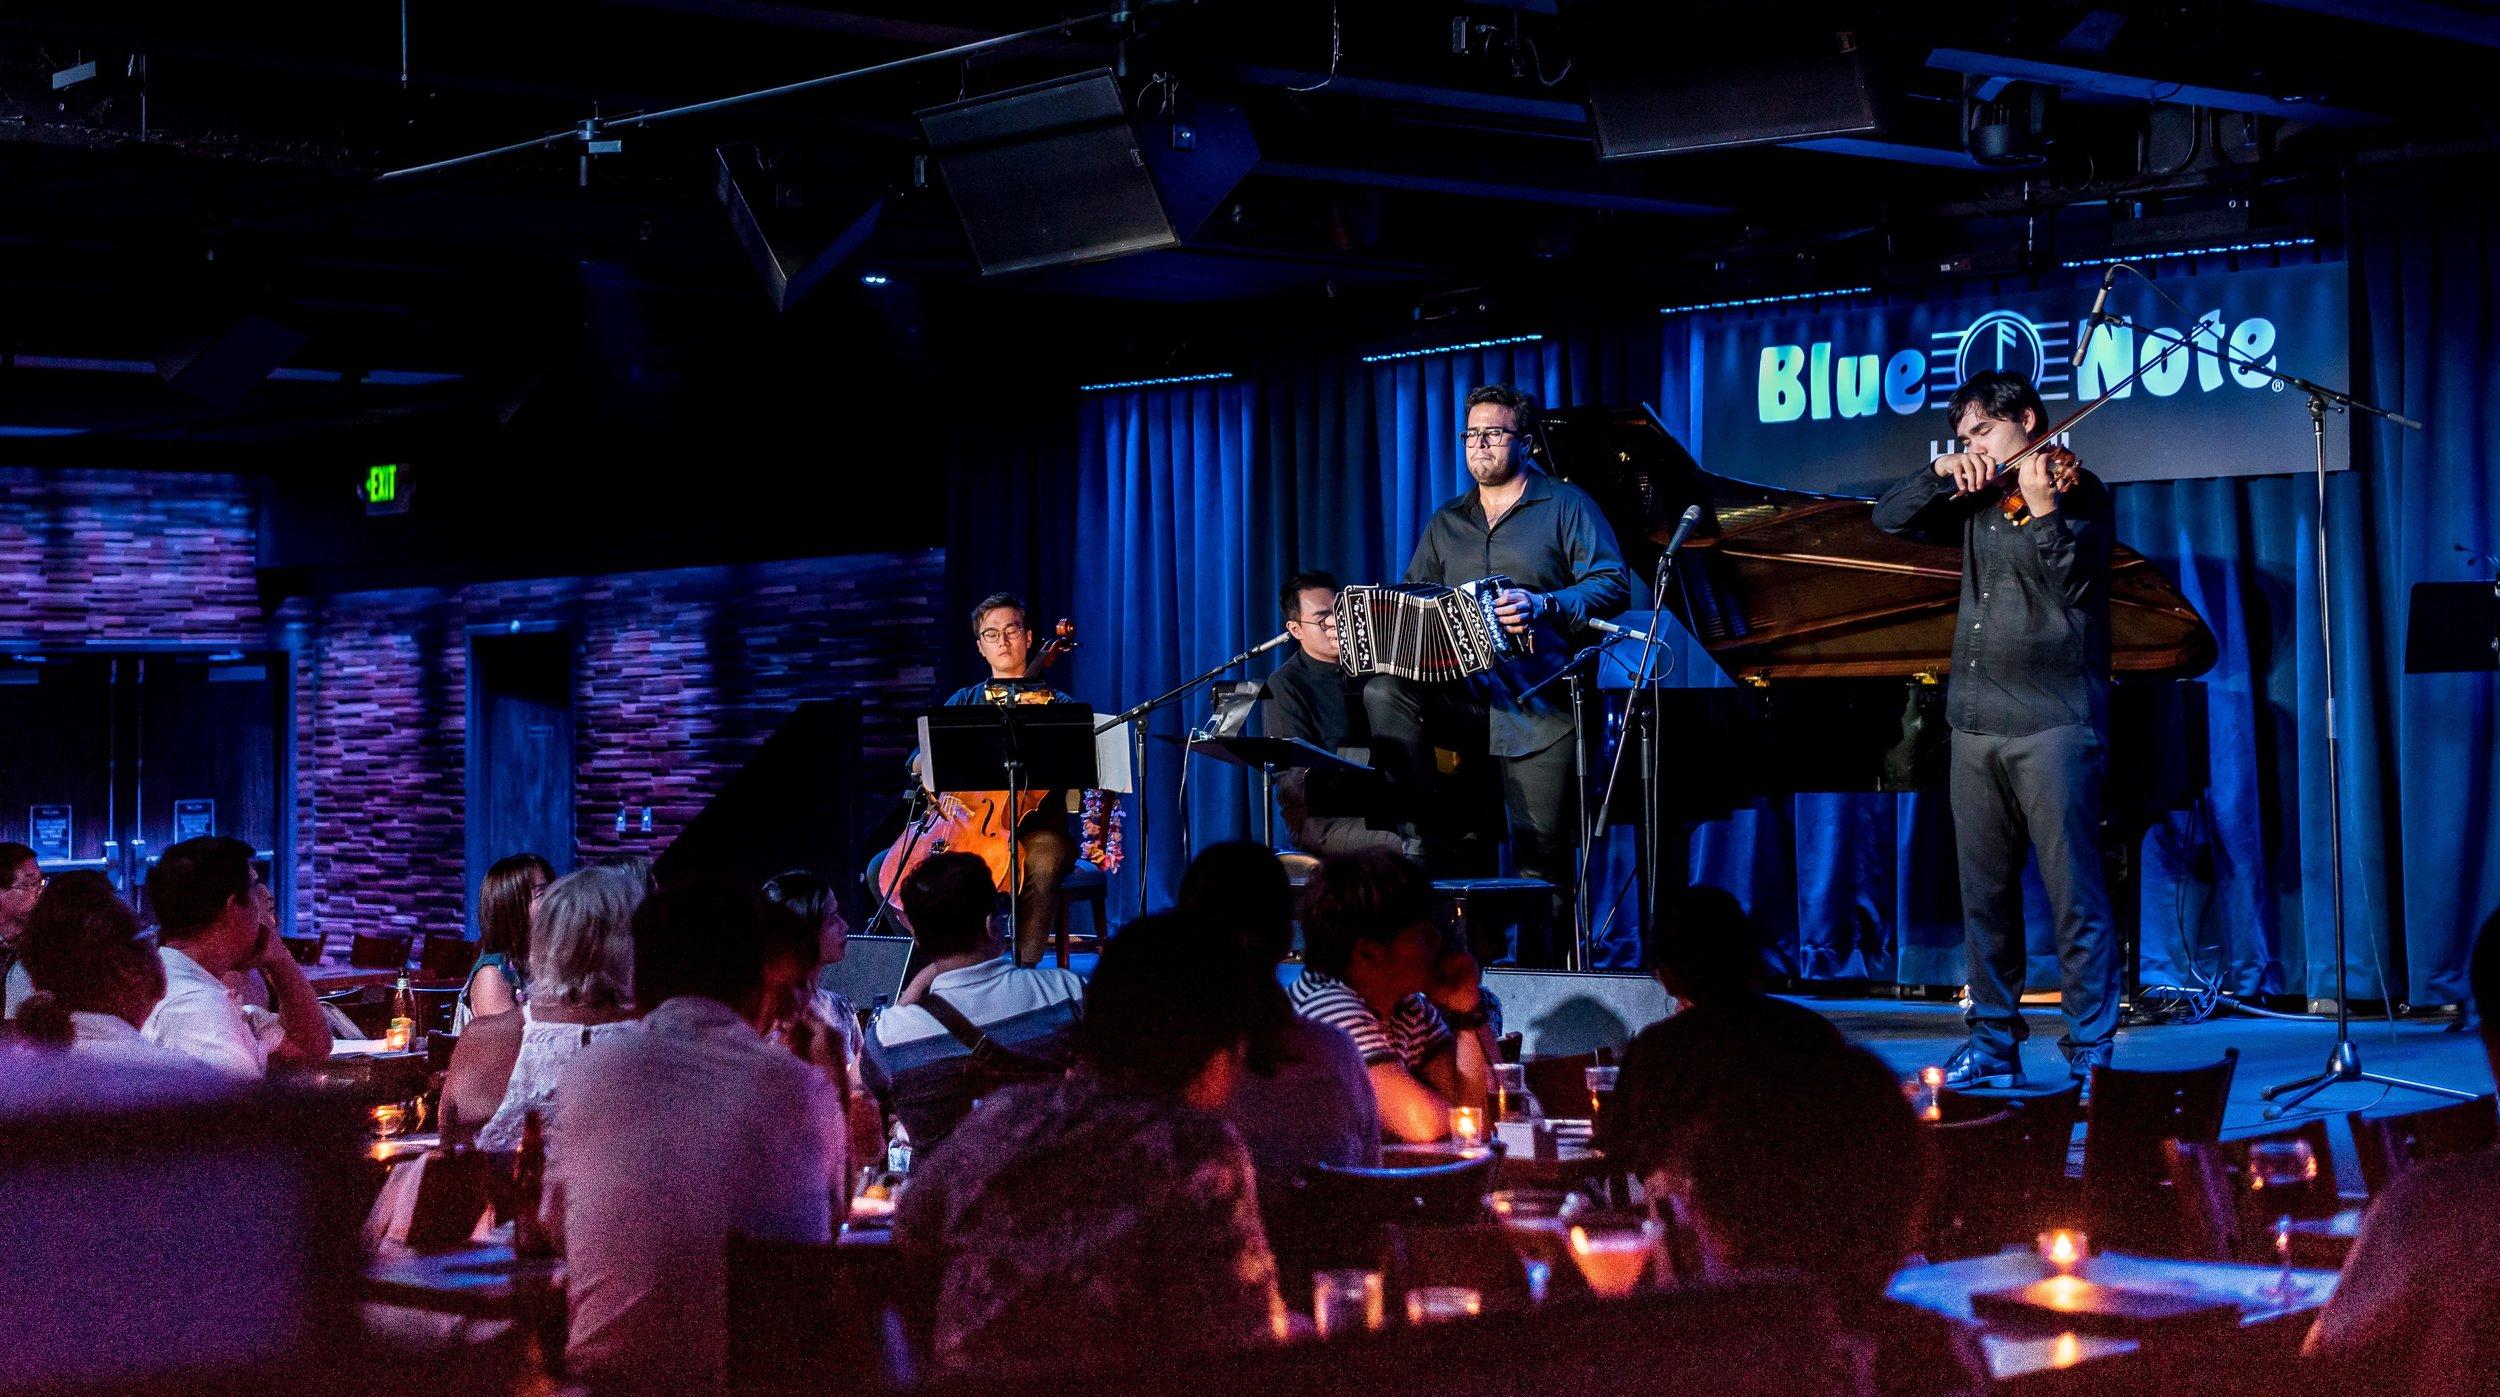 Season Opener JP Jofre Nuevo Tango Quartet co-presented with Blue Note Hawaii